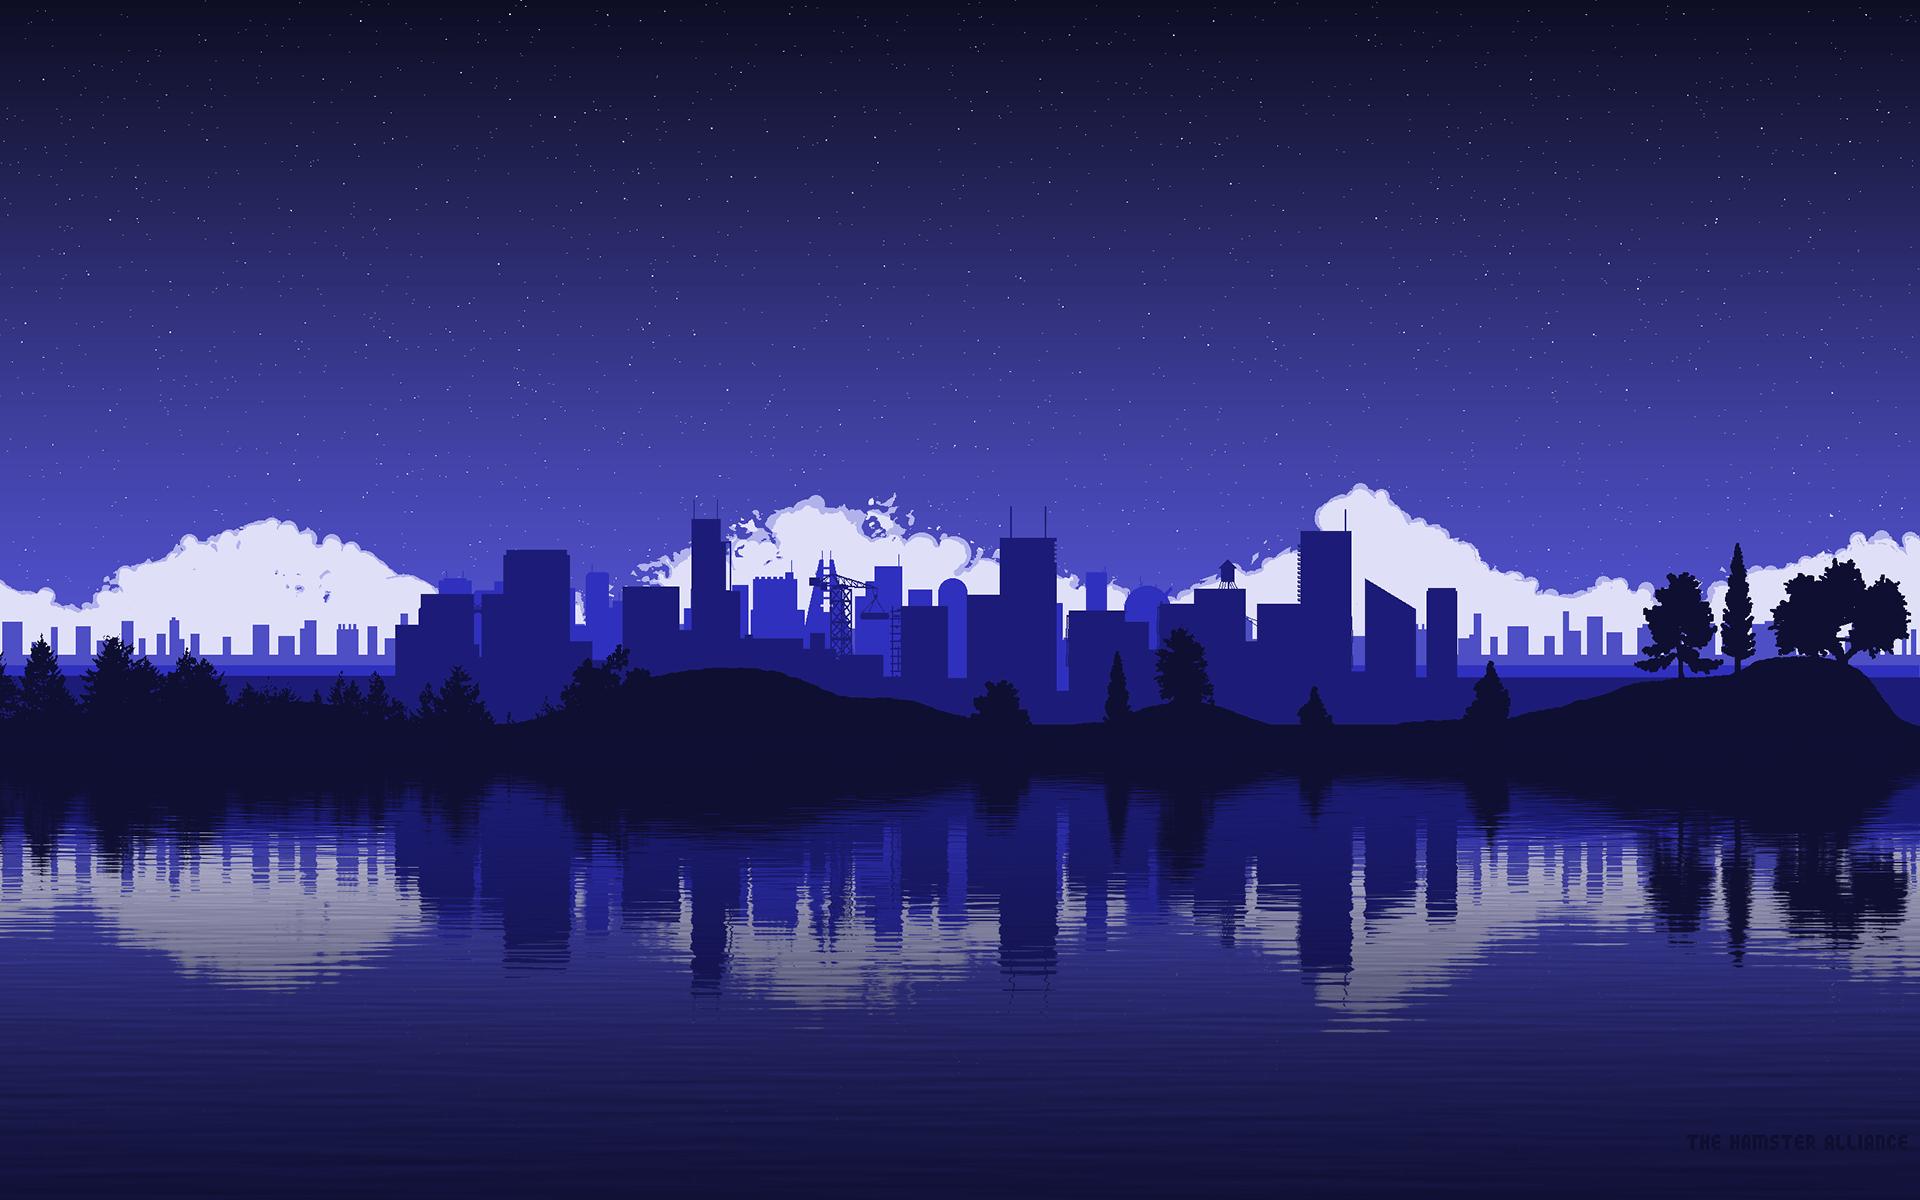 city pixel art wallpaper